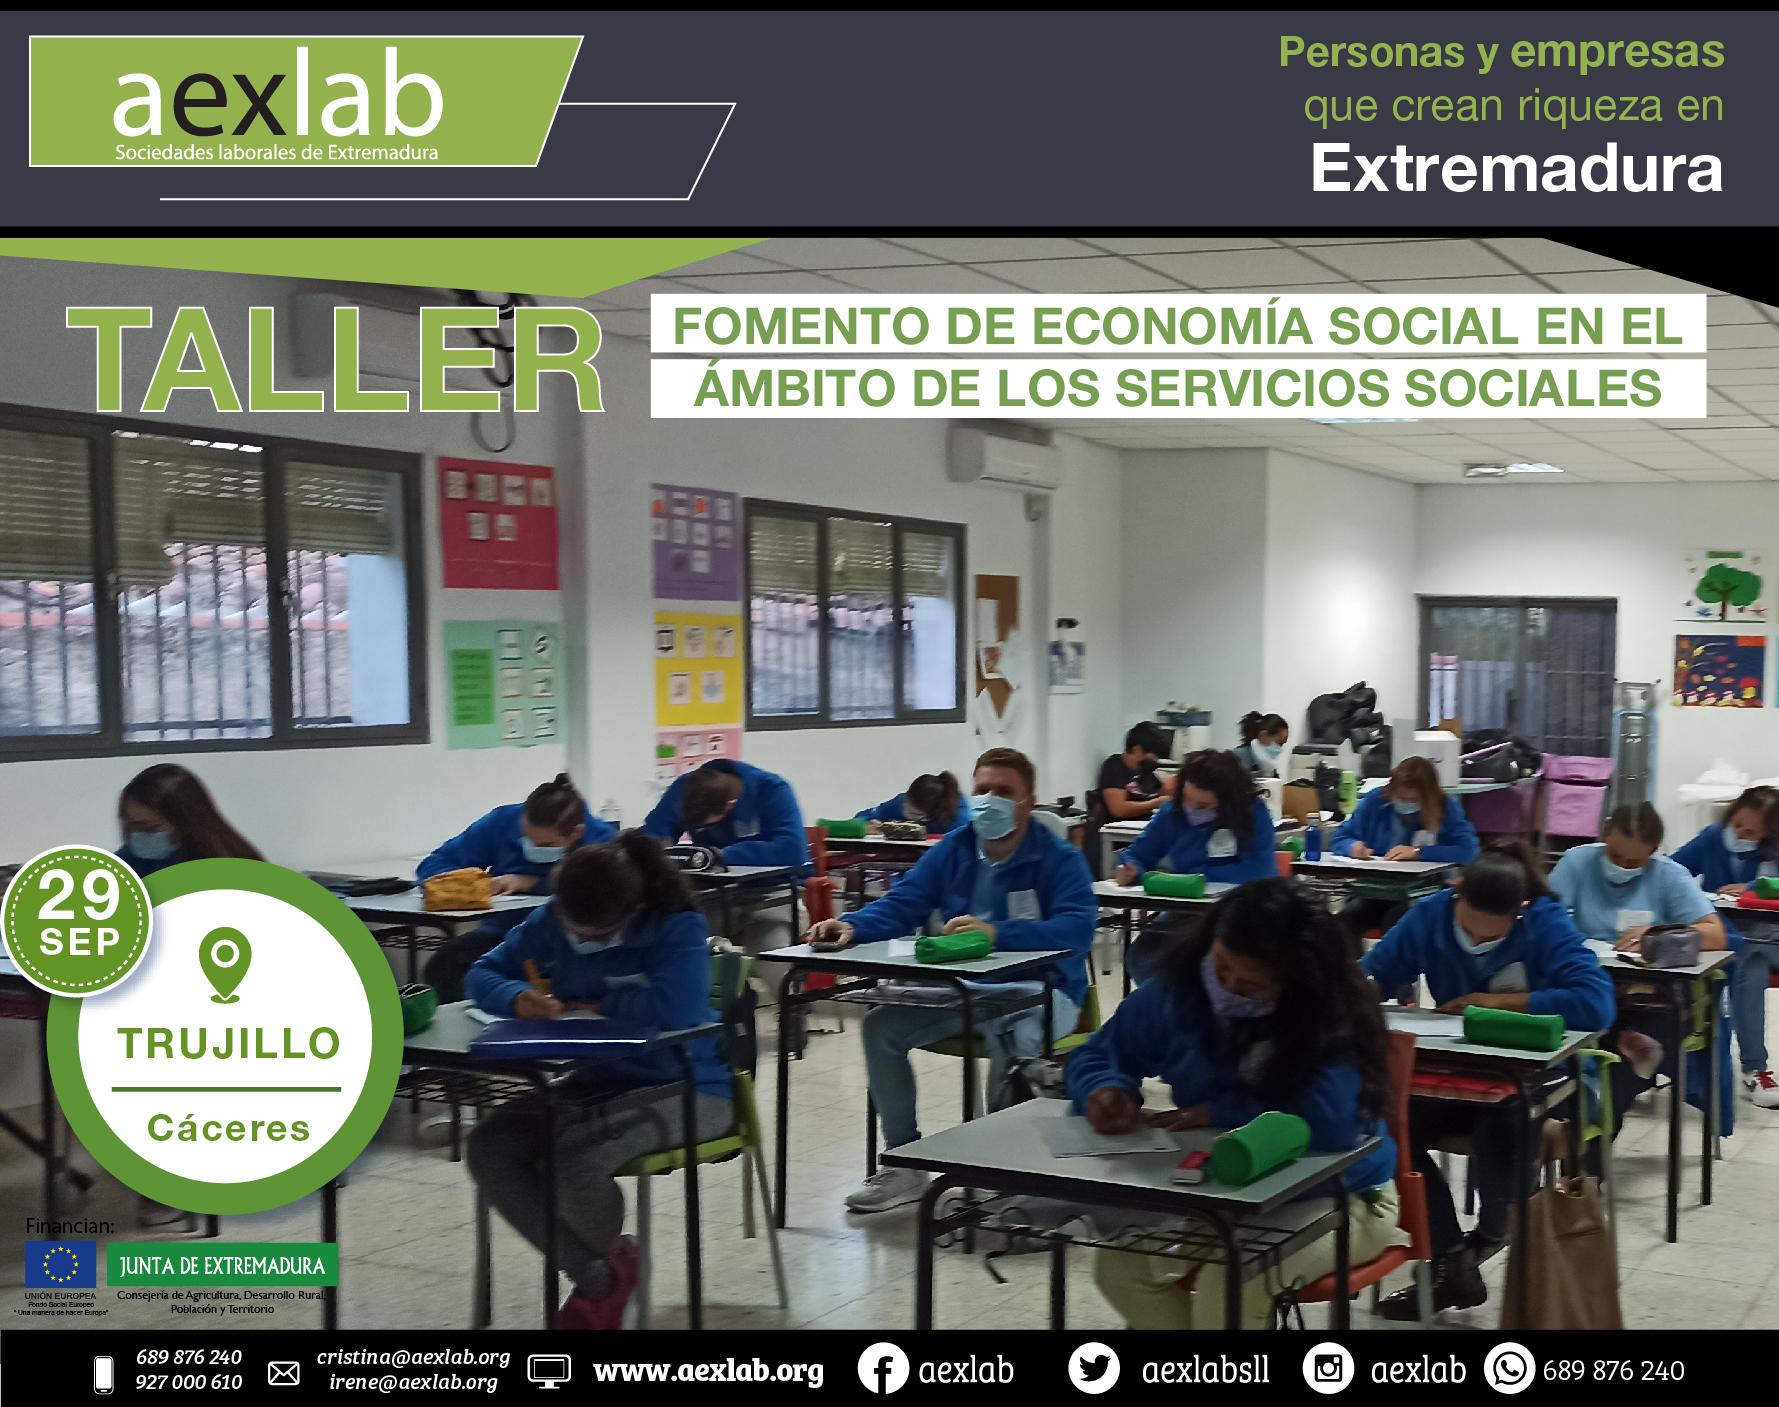 Alumnos taller trujillo ambito social aexlab 2020-03